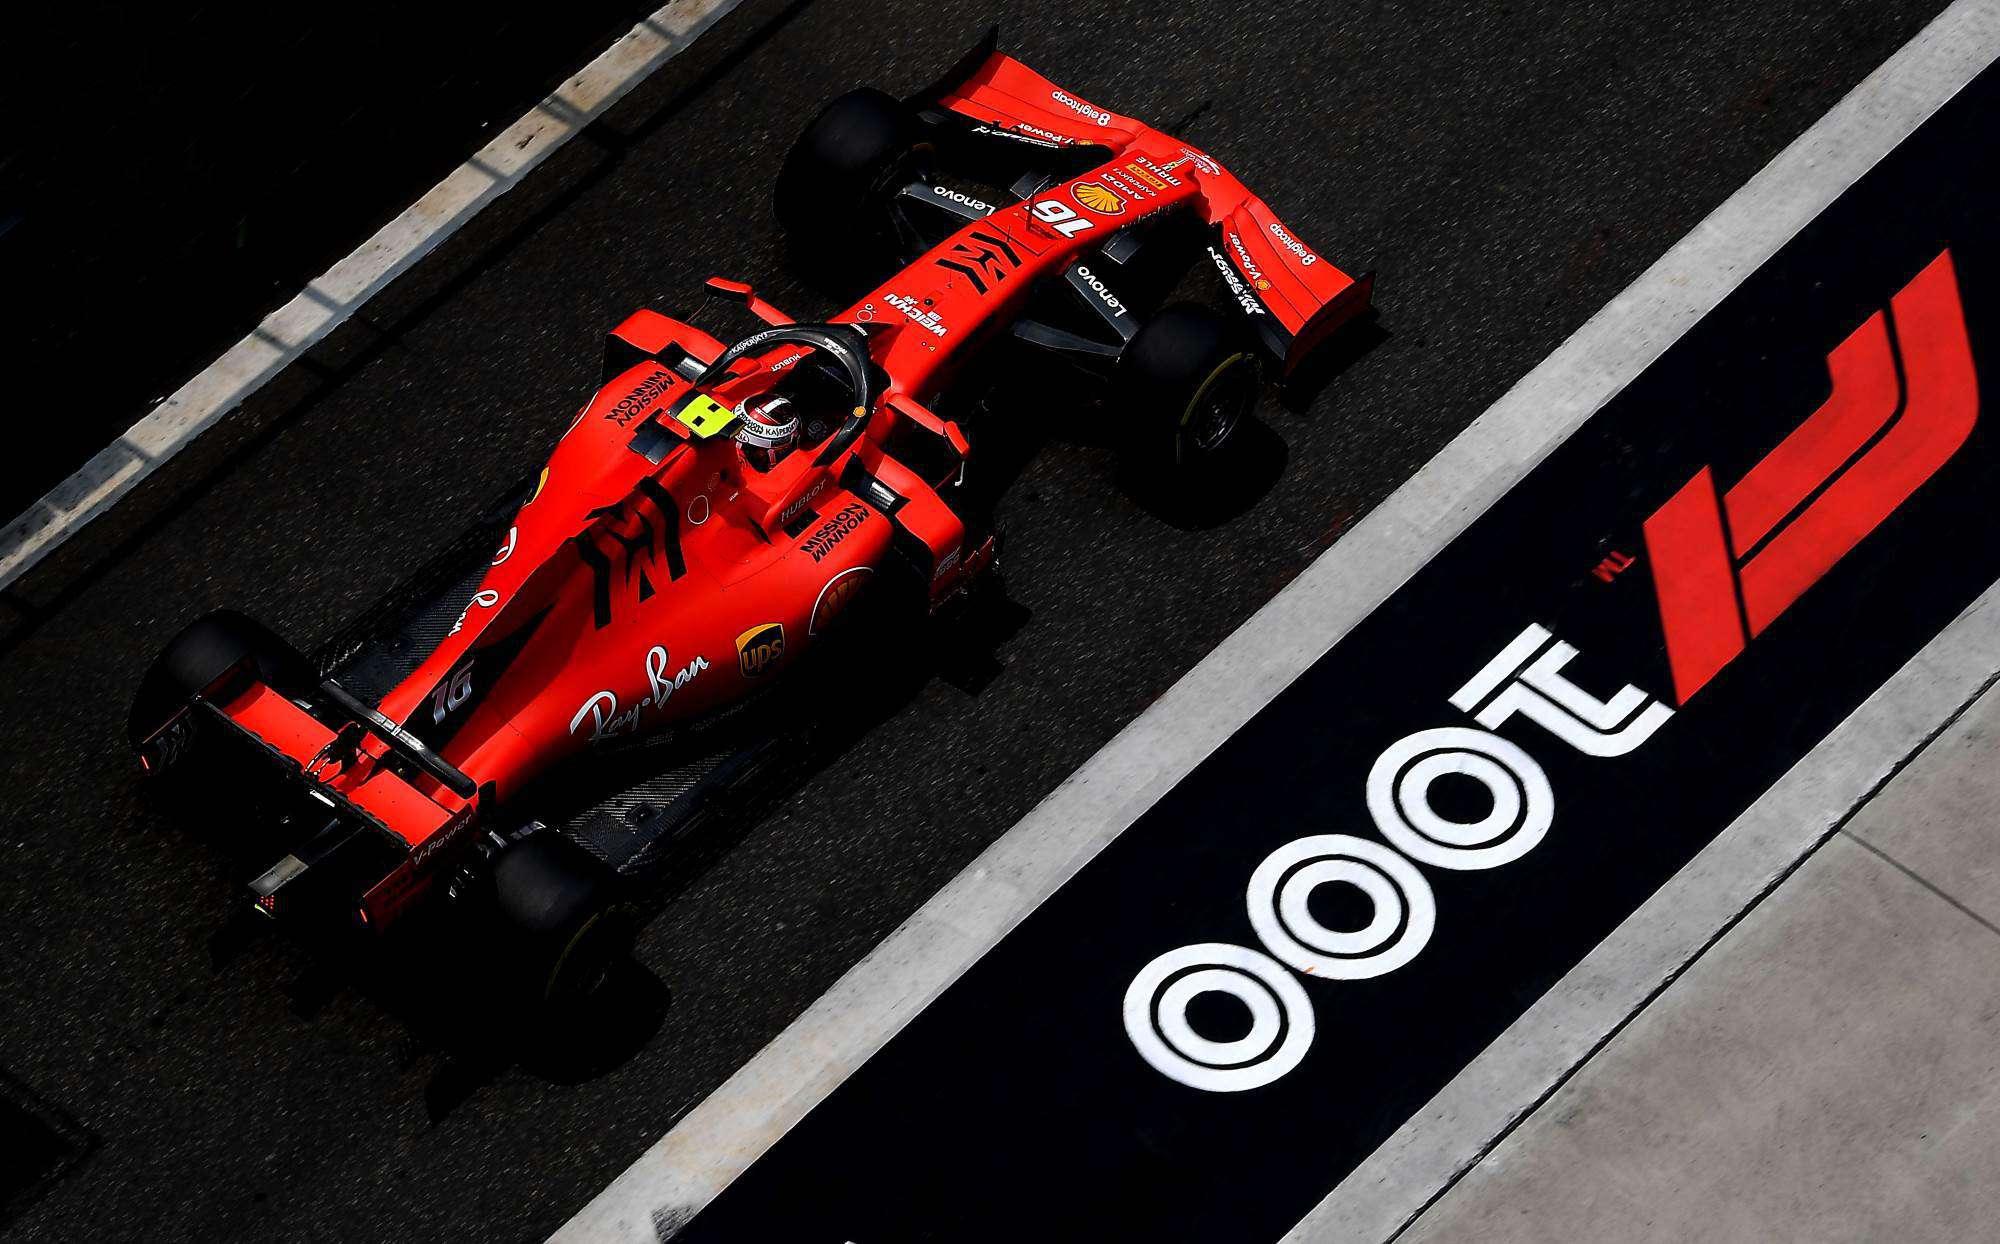 Charles-Leclerc-Ferrari-Chinese-GP-F1-2019-pitlane-F1-1000th-race-Photo-Ferrari